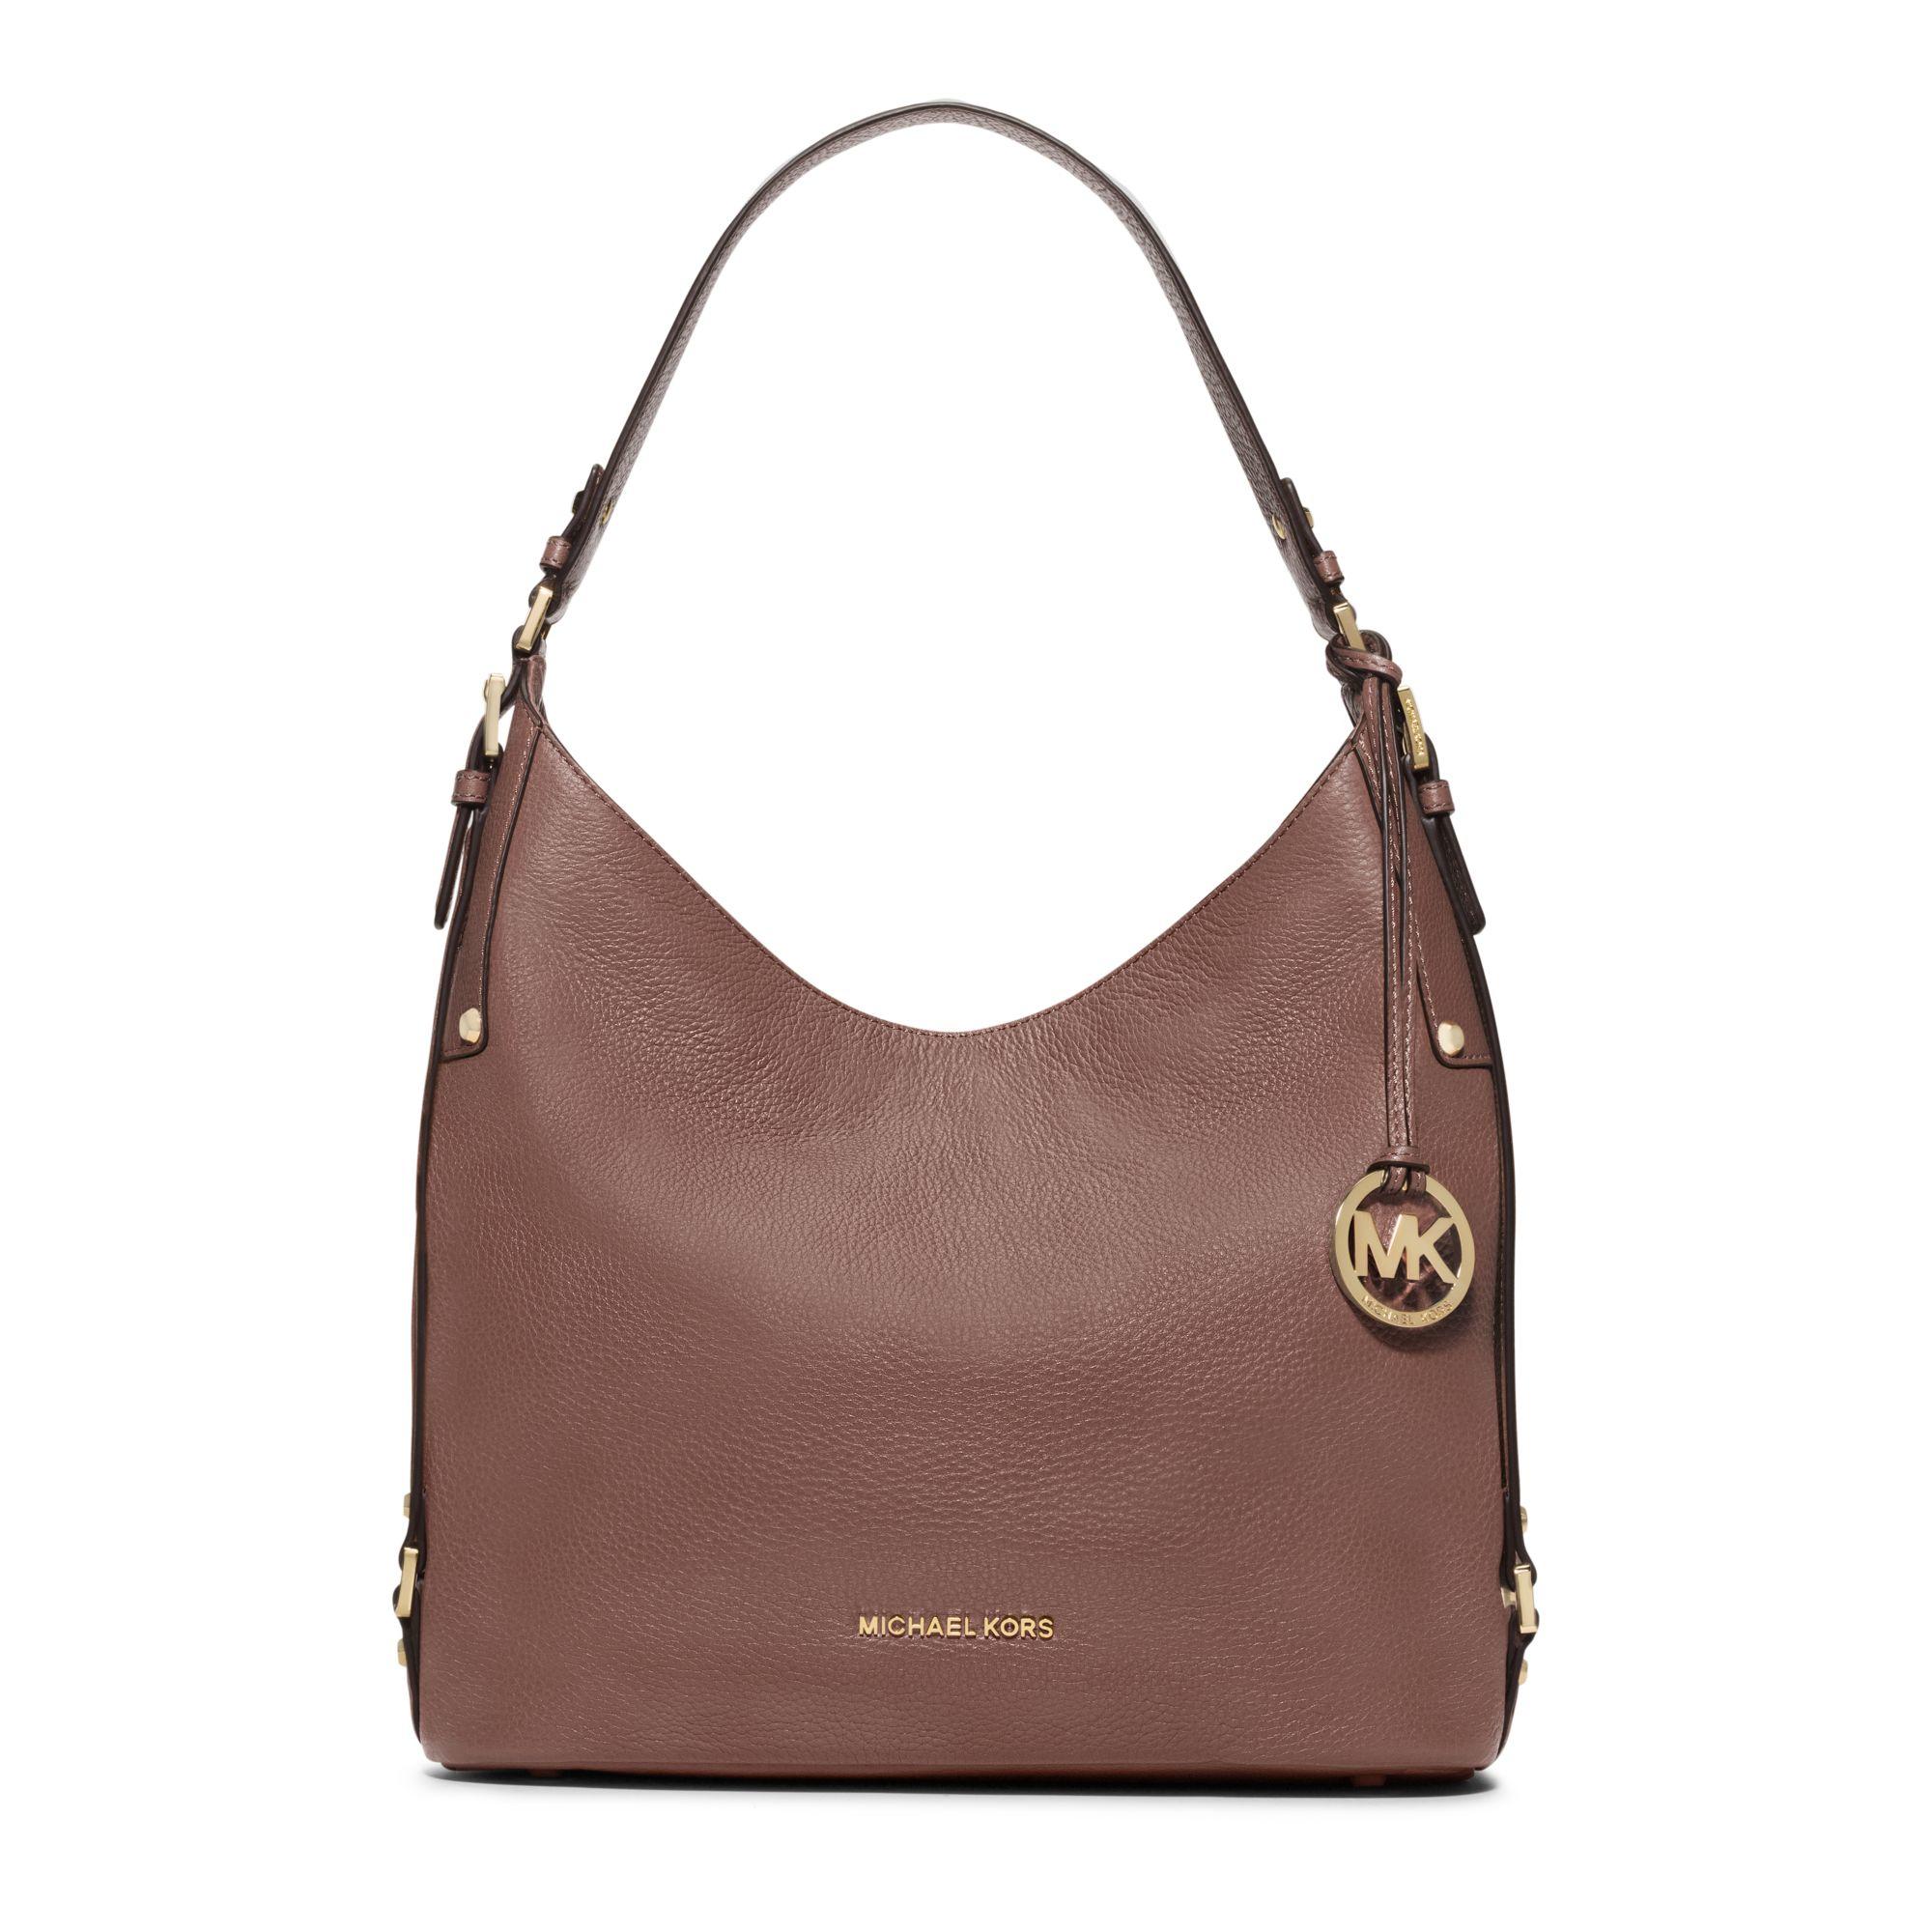 ffc61208b0f5 Michael Michael Kors Women's Bedford Large Leather Shoulder Bag Handbag